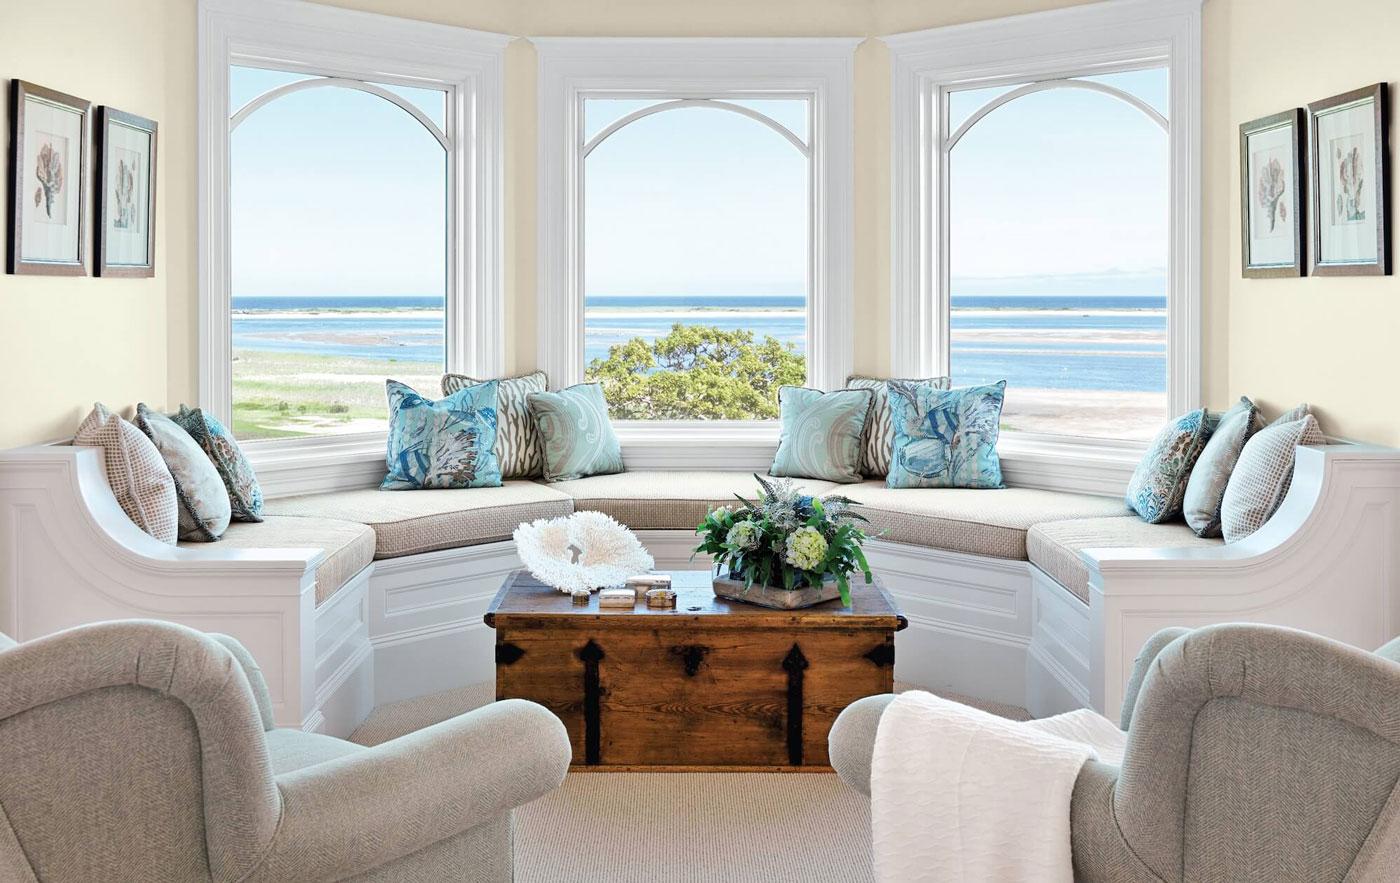 Built in window seat along bay window overlooking the water